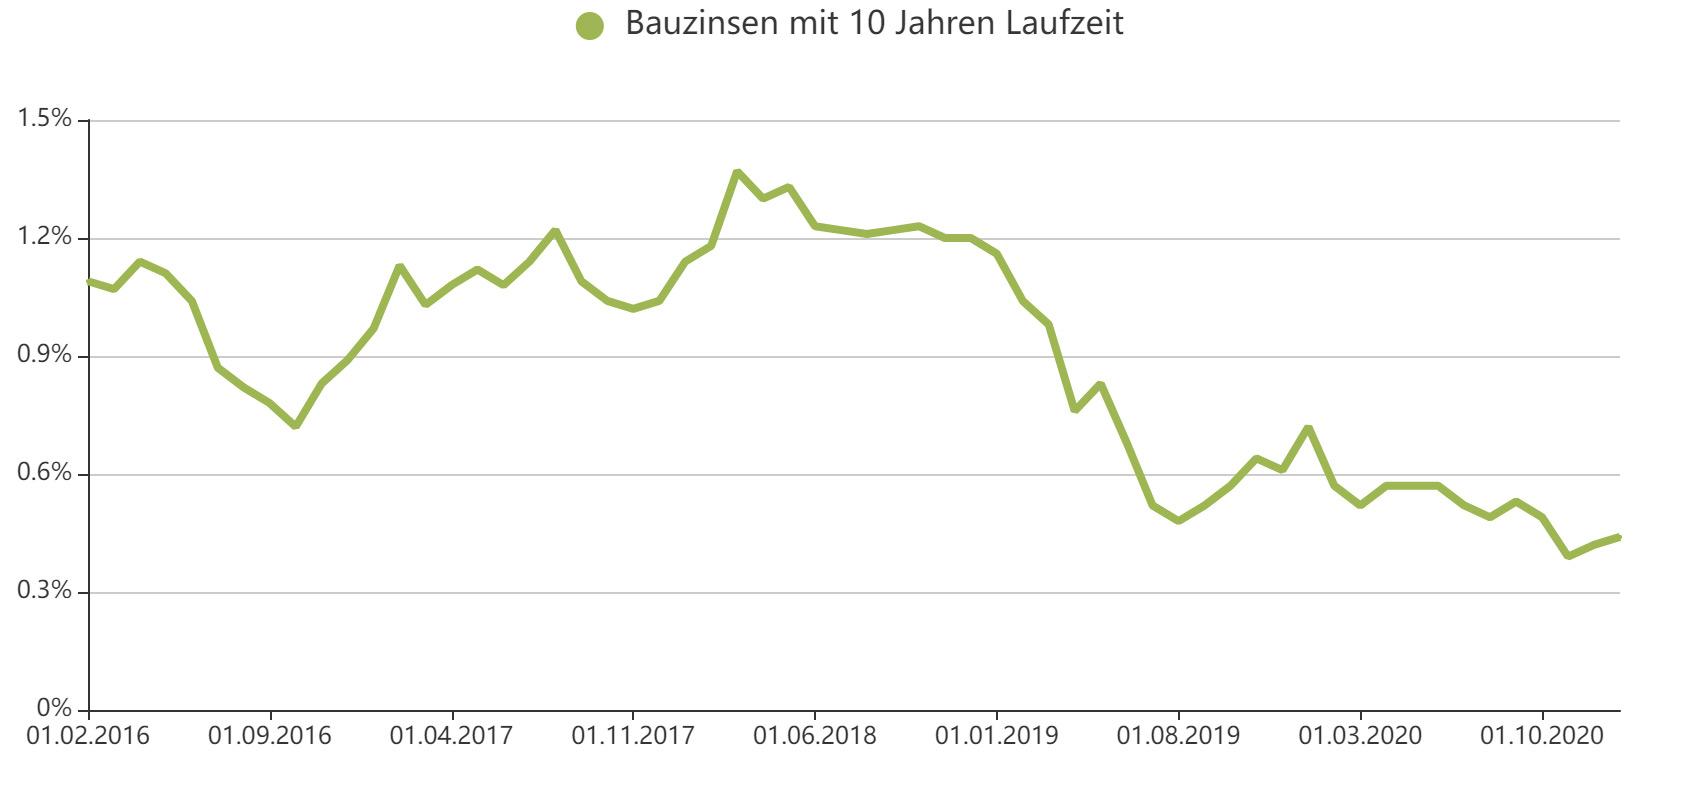 Baufinanzierung Aue-Fallstein